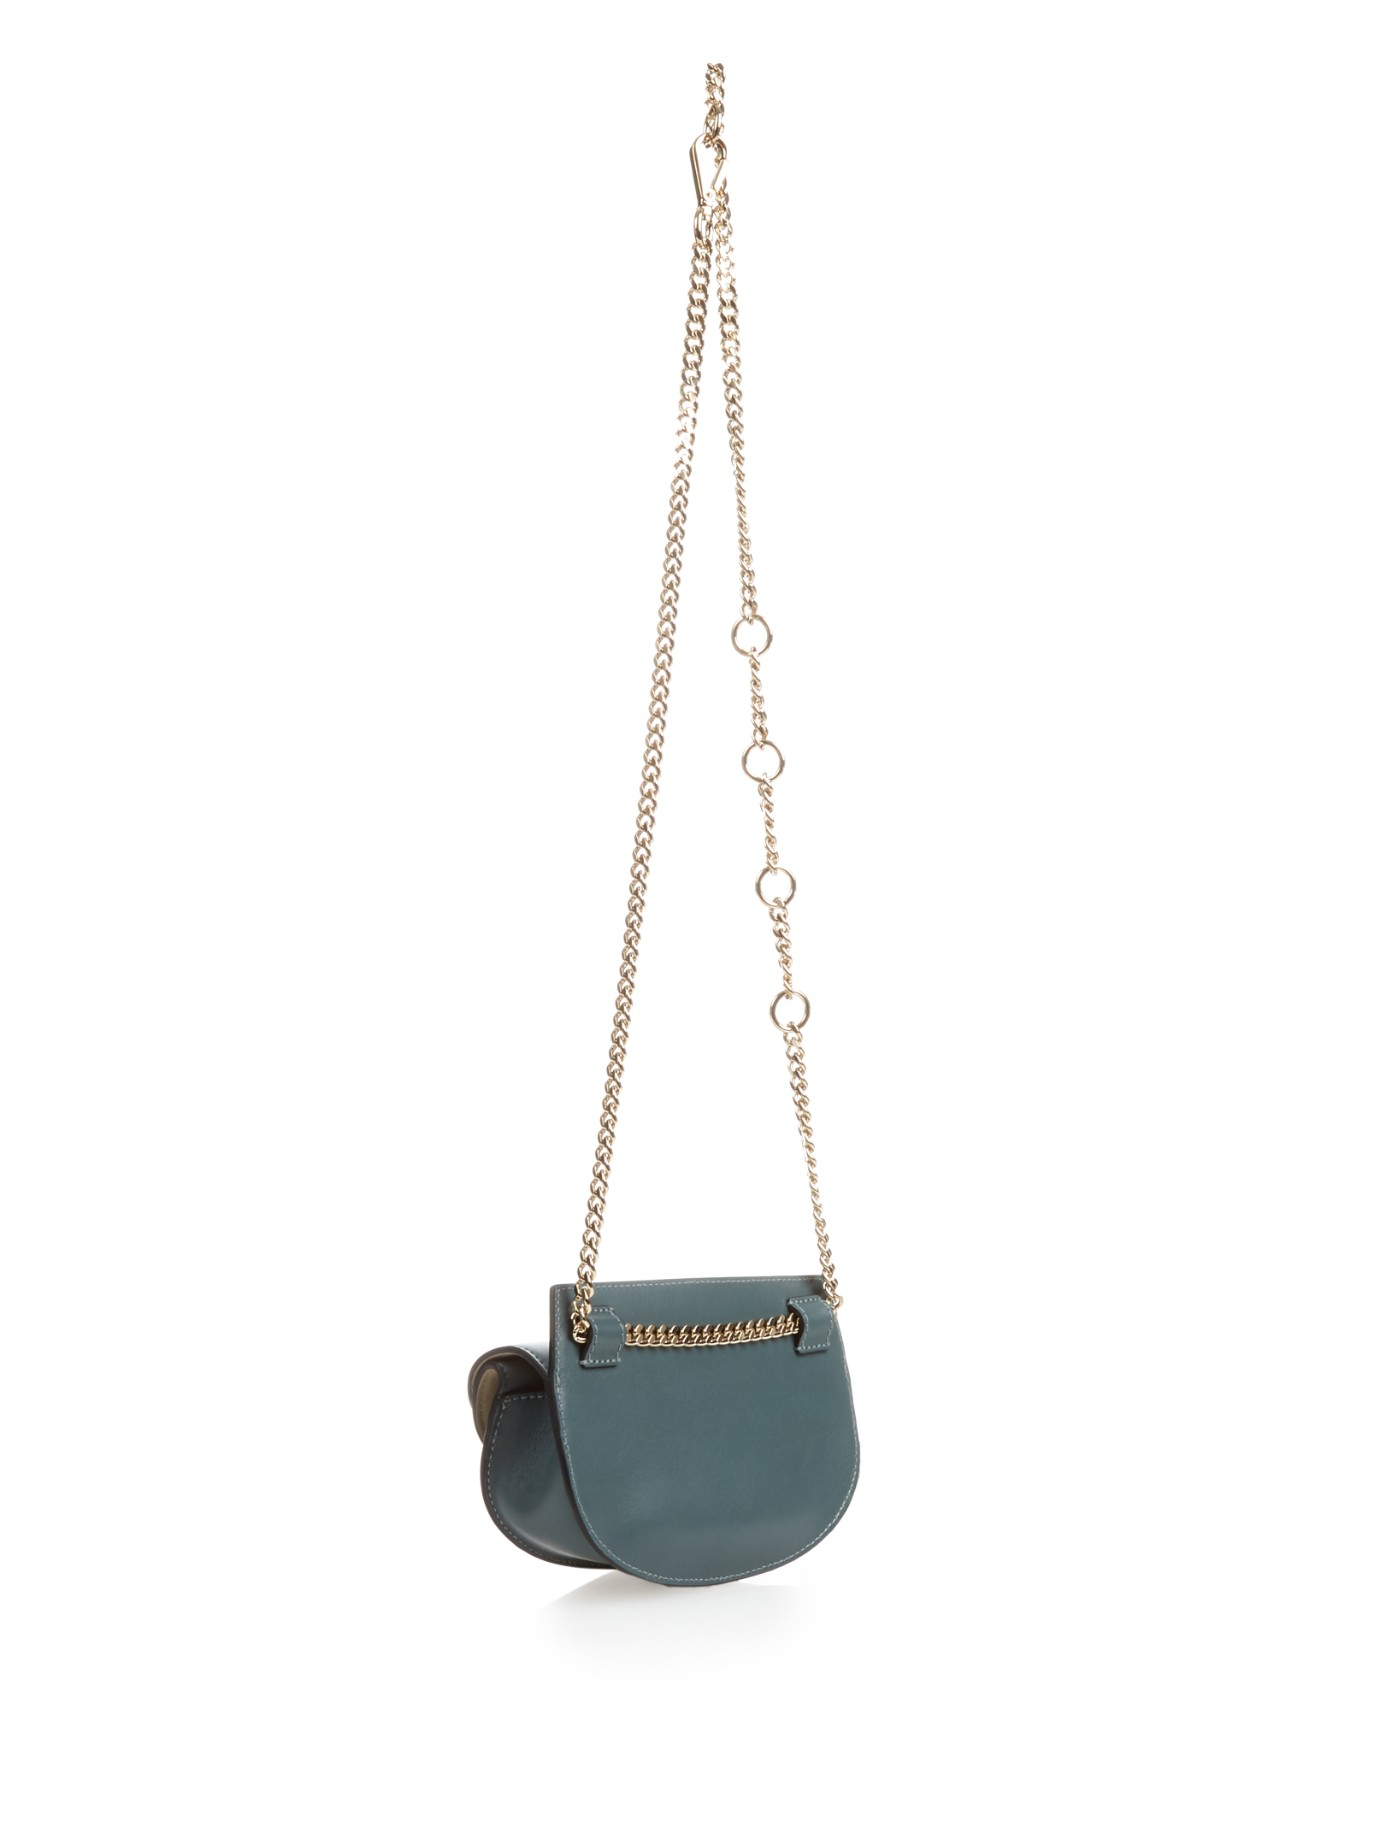 chloe handbags fake - Chlo�� Georgia Leather Cross-body Bag in Blue (LIGHT BLUE) | Lyst